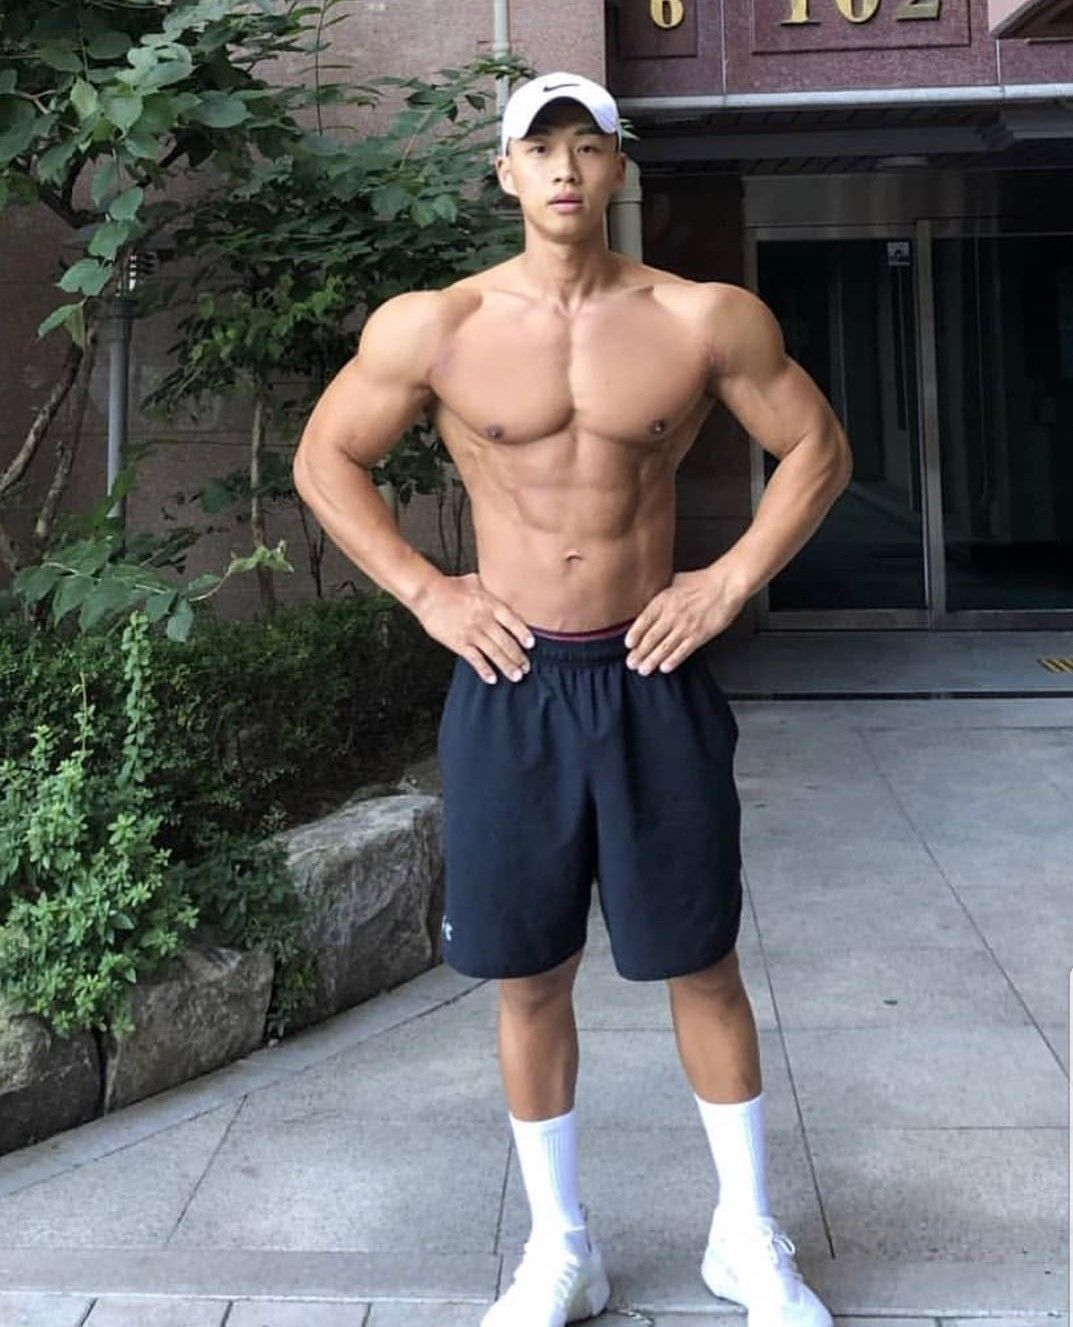 Pin by Raquaza koko on ASIAN BOYS | Asian men, Asian, Men